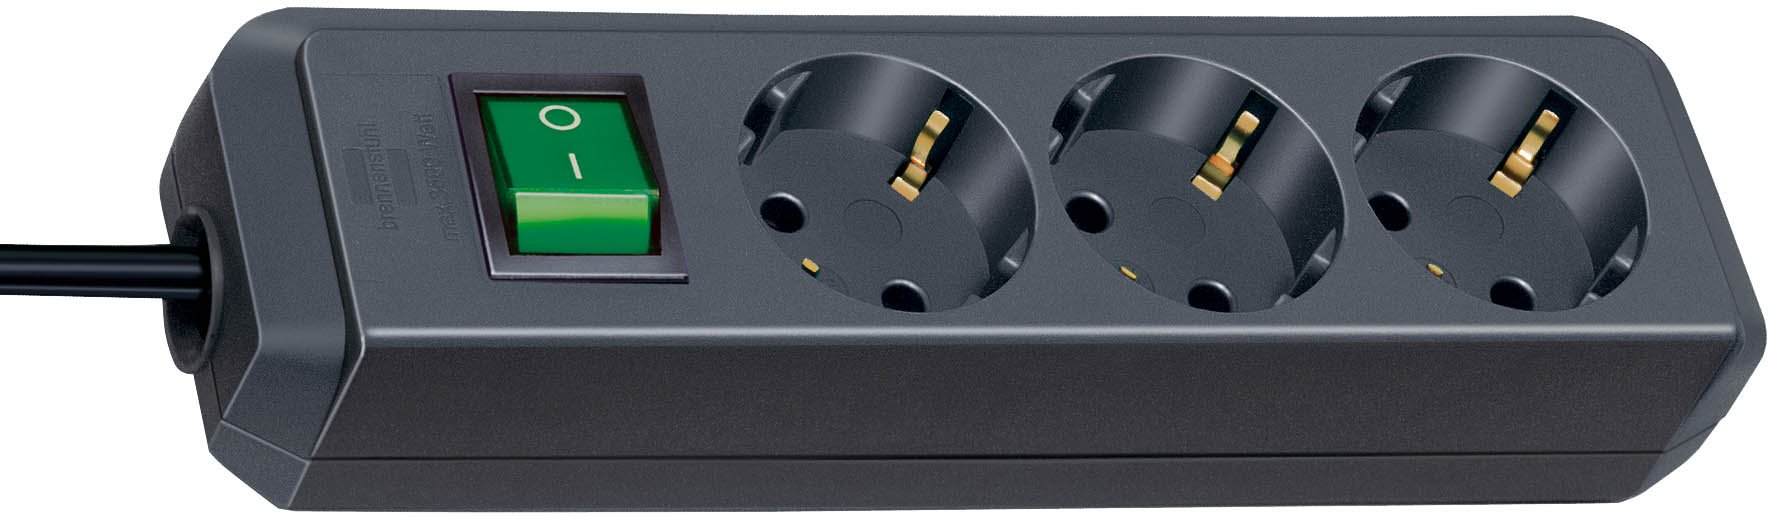 Brennenstuh 149906 - Regleta Eco con 3 tomas + interruptor, 1.5m, color negro product image